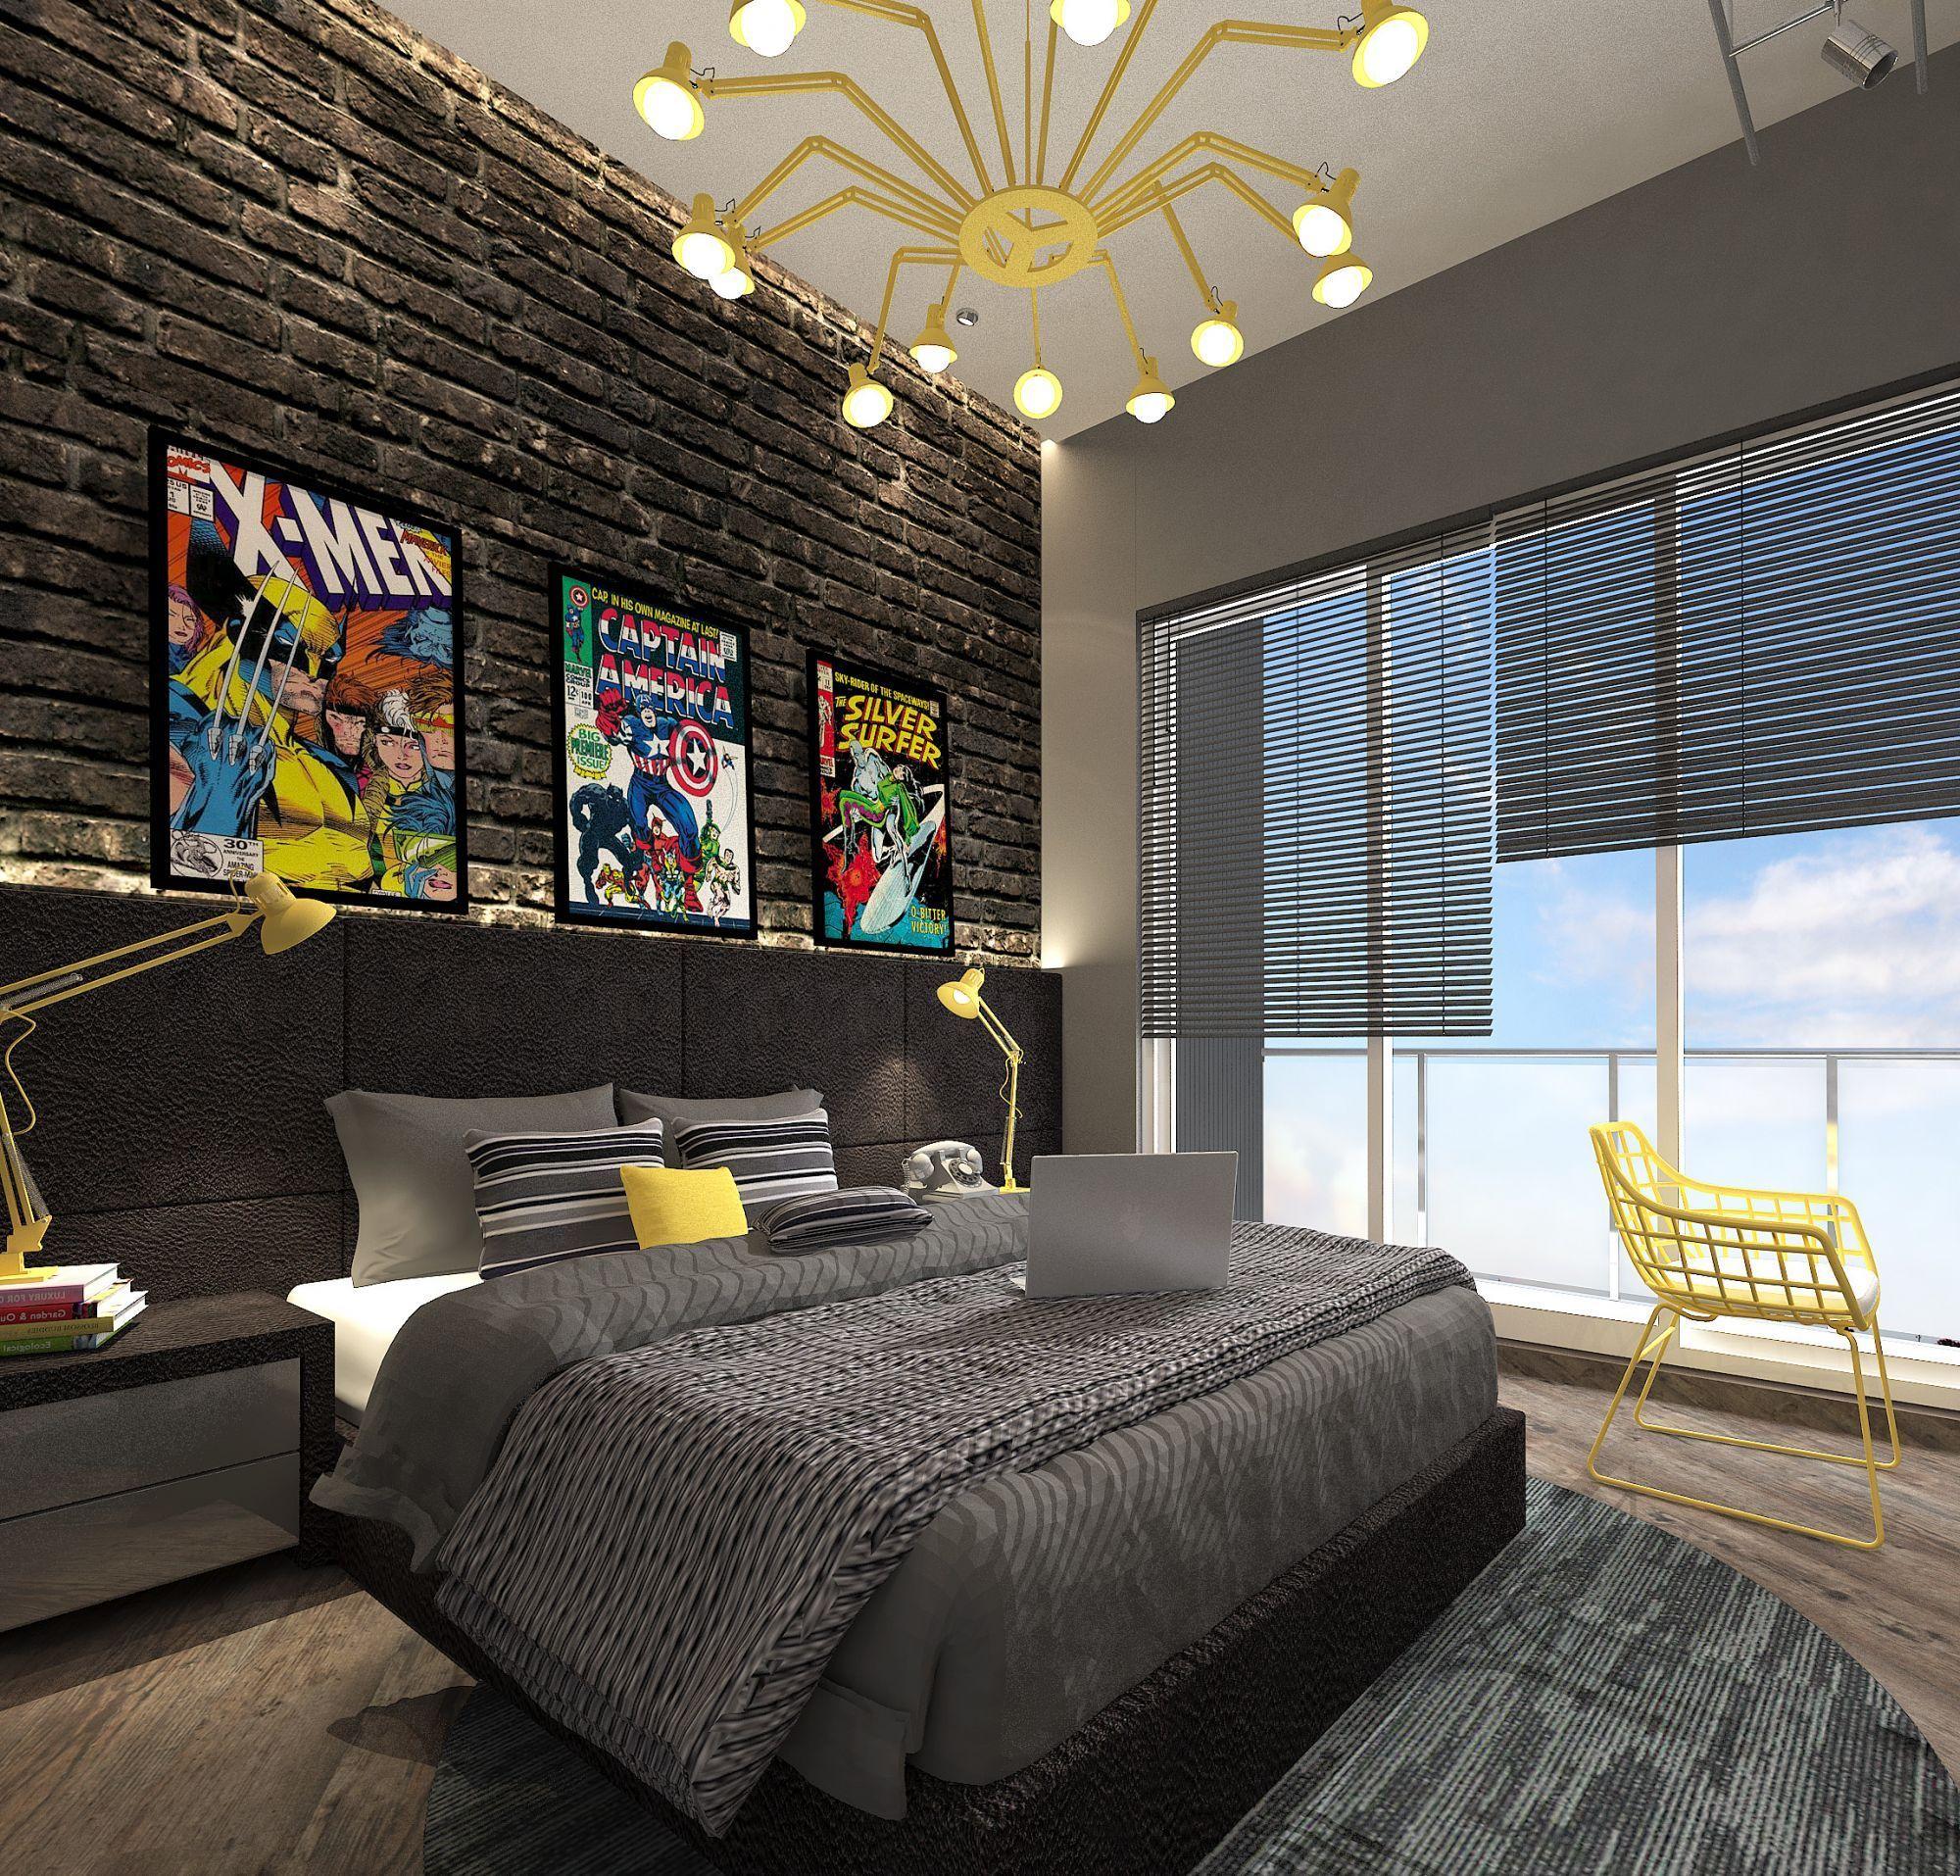 55 Wonderful Boys Room Design Ideas: Cgarchitect Professional 3d Architectural Visualization